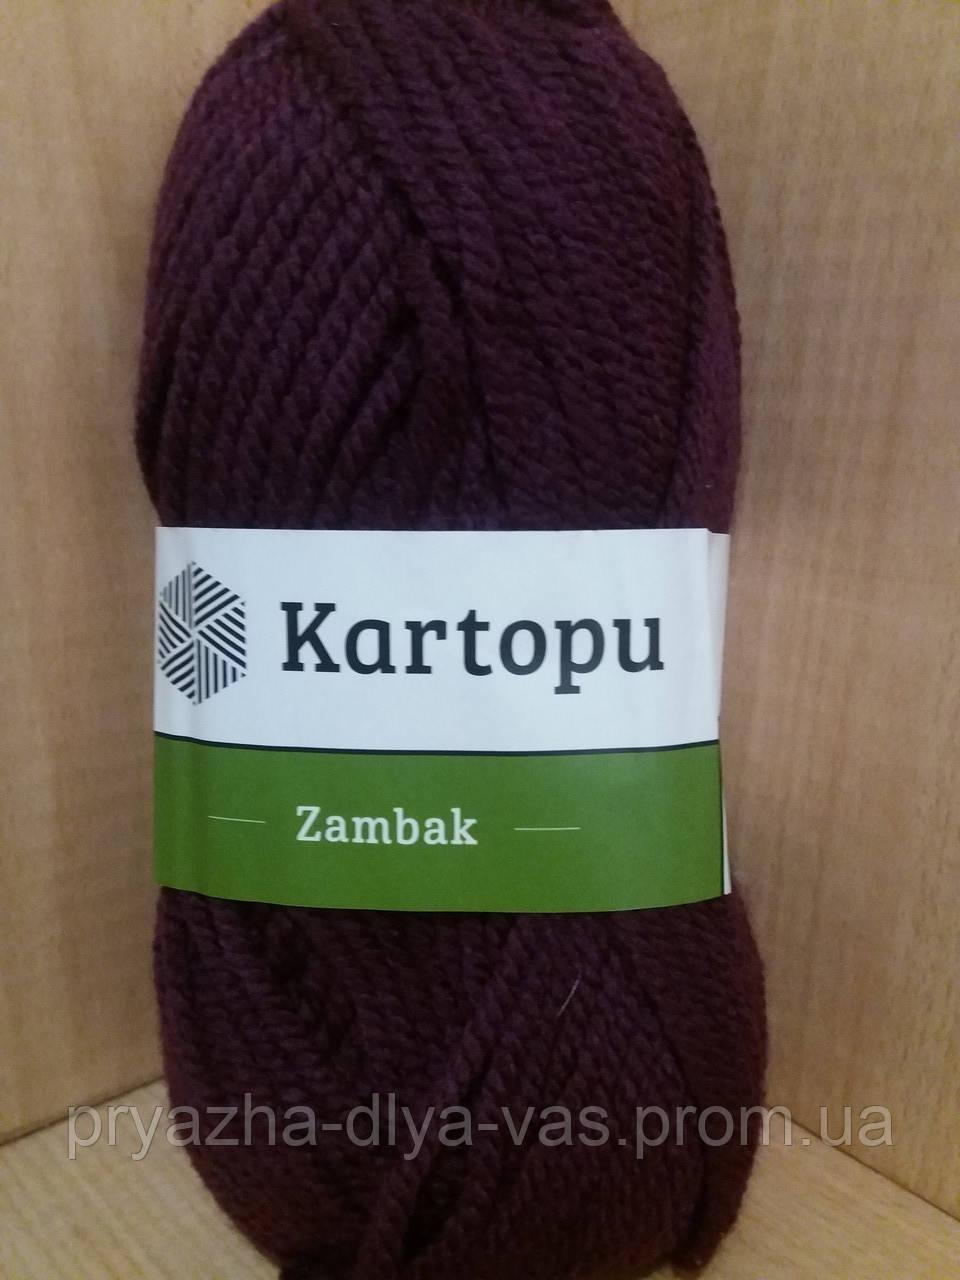 Акриловая пряжа (100%- акрил, 100 г/133 м) Kartopu Zambak K729 (т.баклажан)